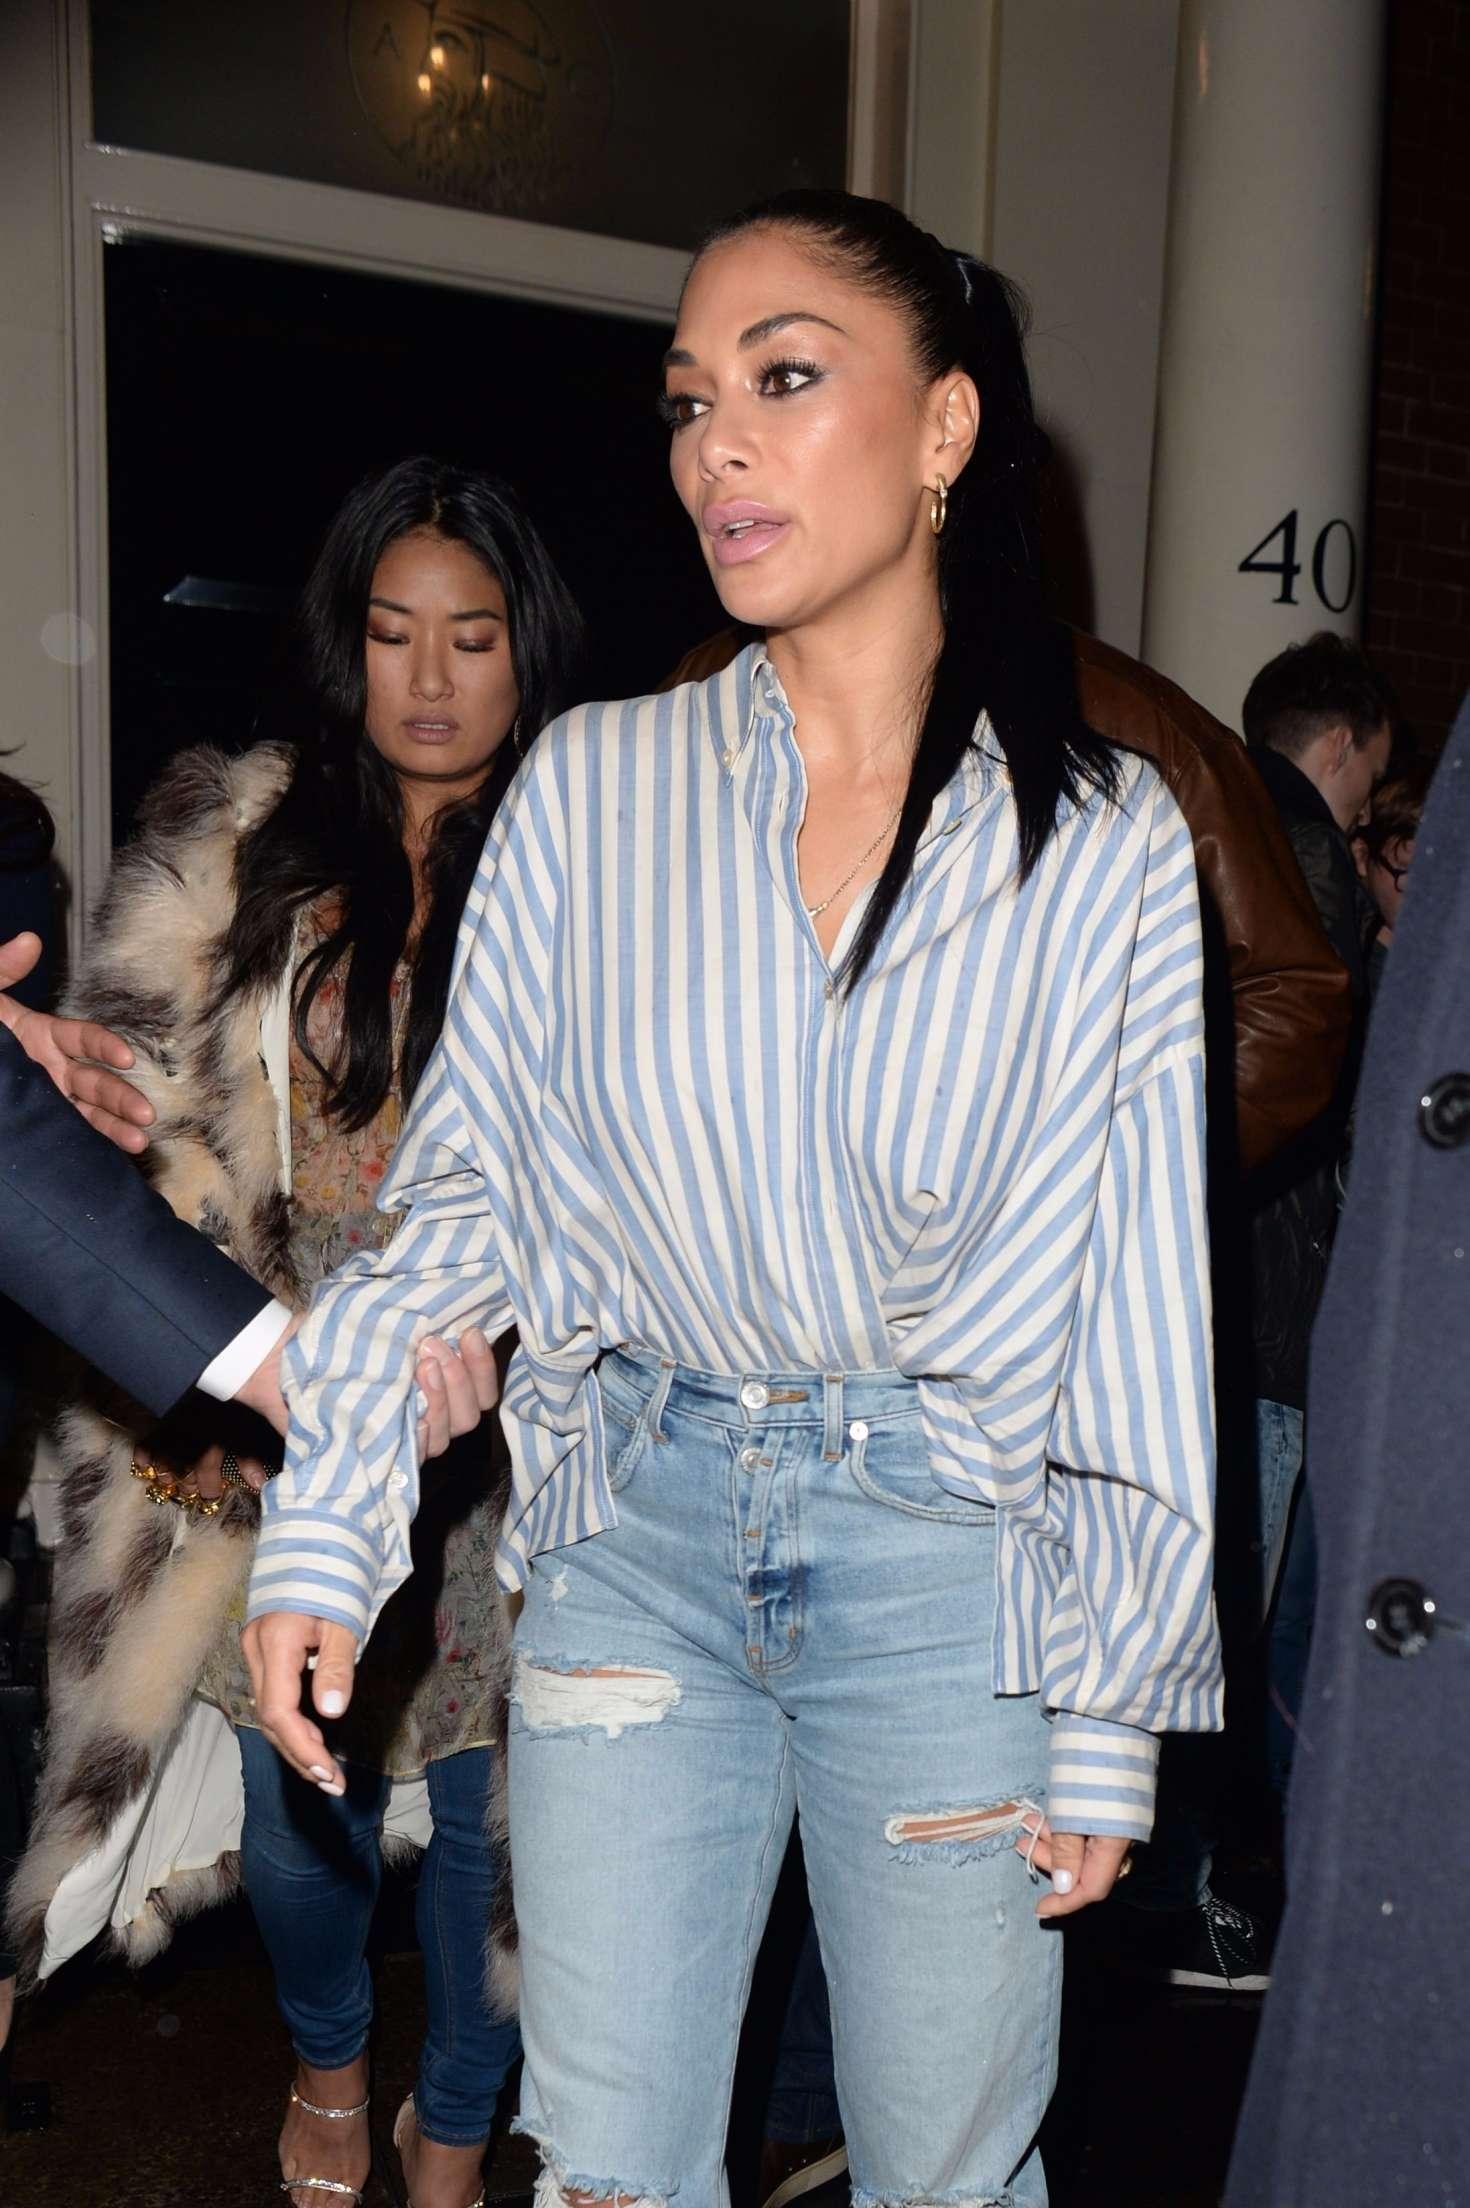 Nicole Scherzinger - Leaving The Arts Club in London